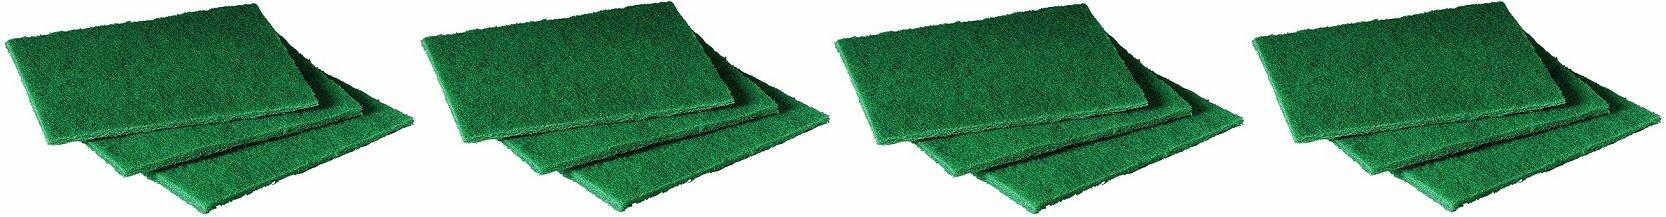 Scotch-Brite 105 General Purpose Scouring Pad, 6'' Length x 4-1/2'' Width, Green (Case of 40) (4-Case of 40))